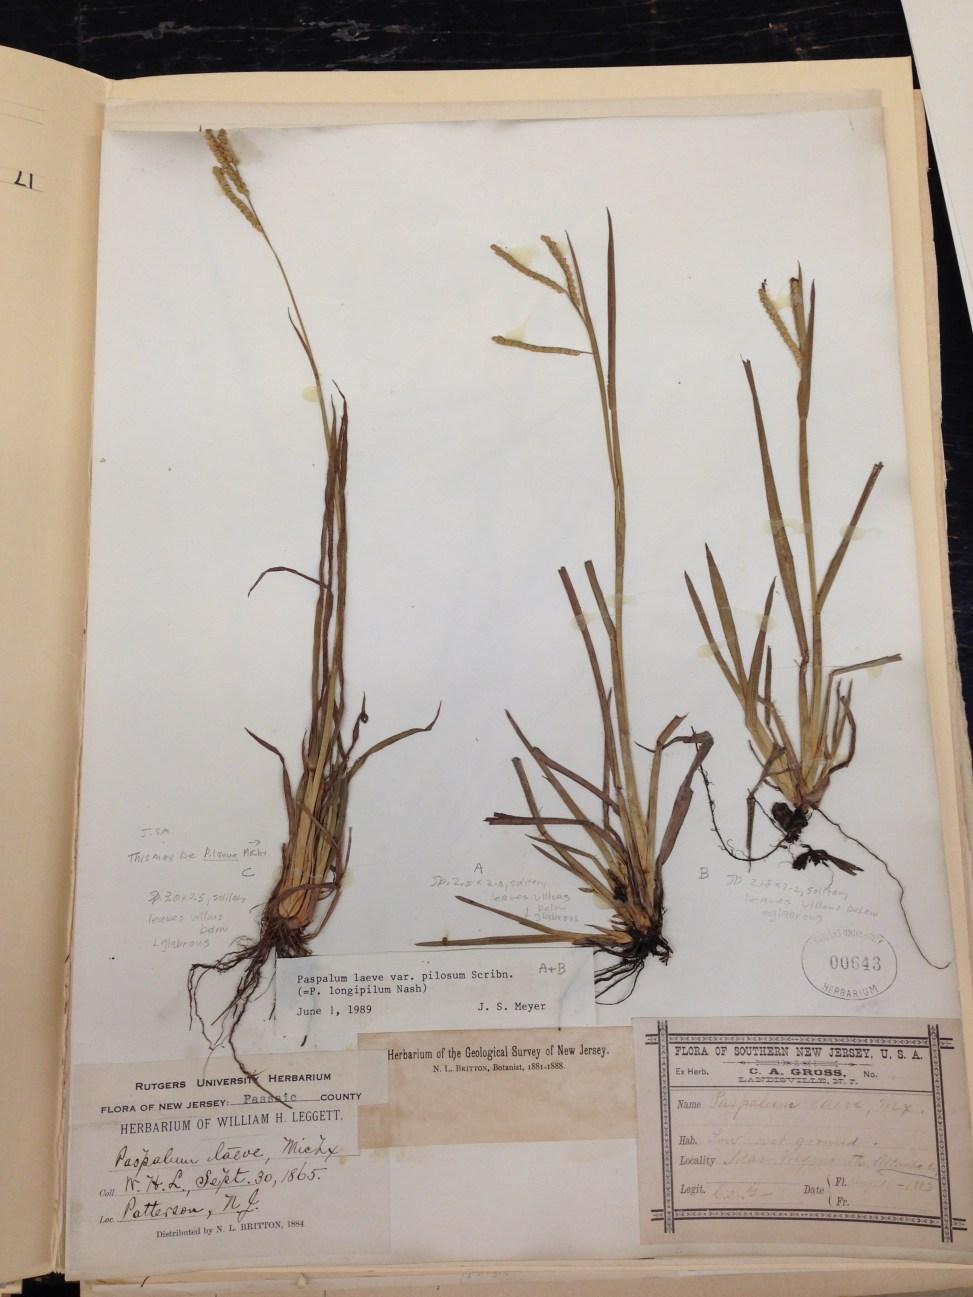 Historical herbarium specimen of Paspalum from Chrysler Herbarium, Rutgers University